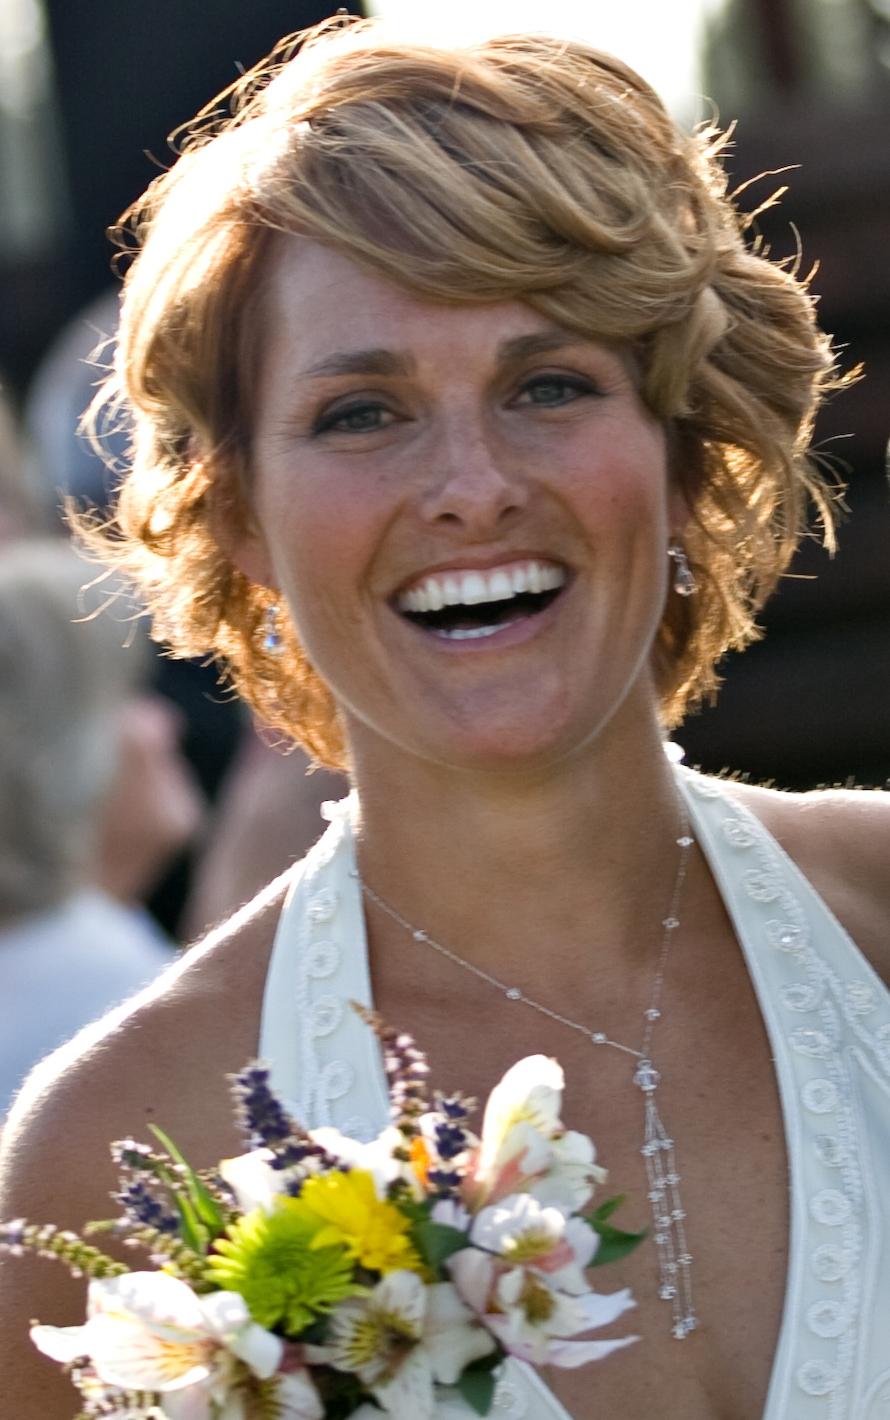 Kari Glessner